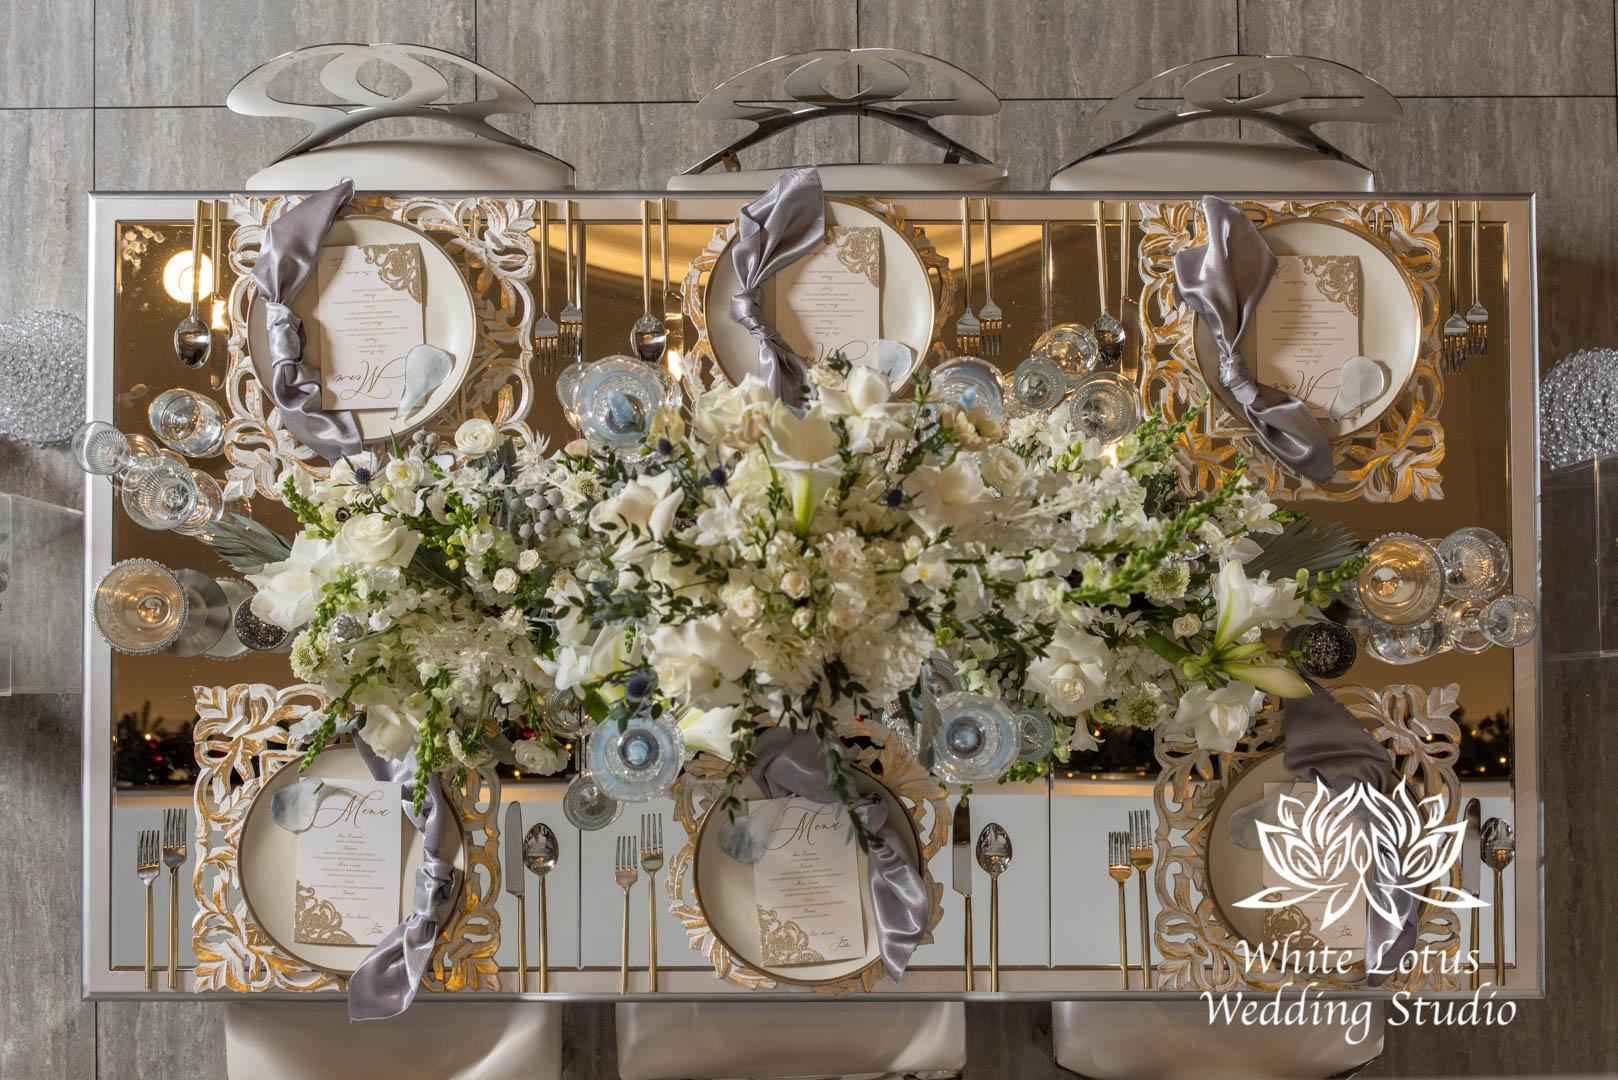 176- GLAM WINTERLUXE WEDDING INSPIRATION